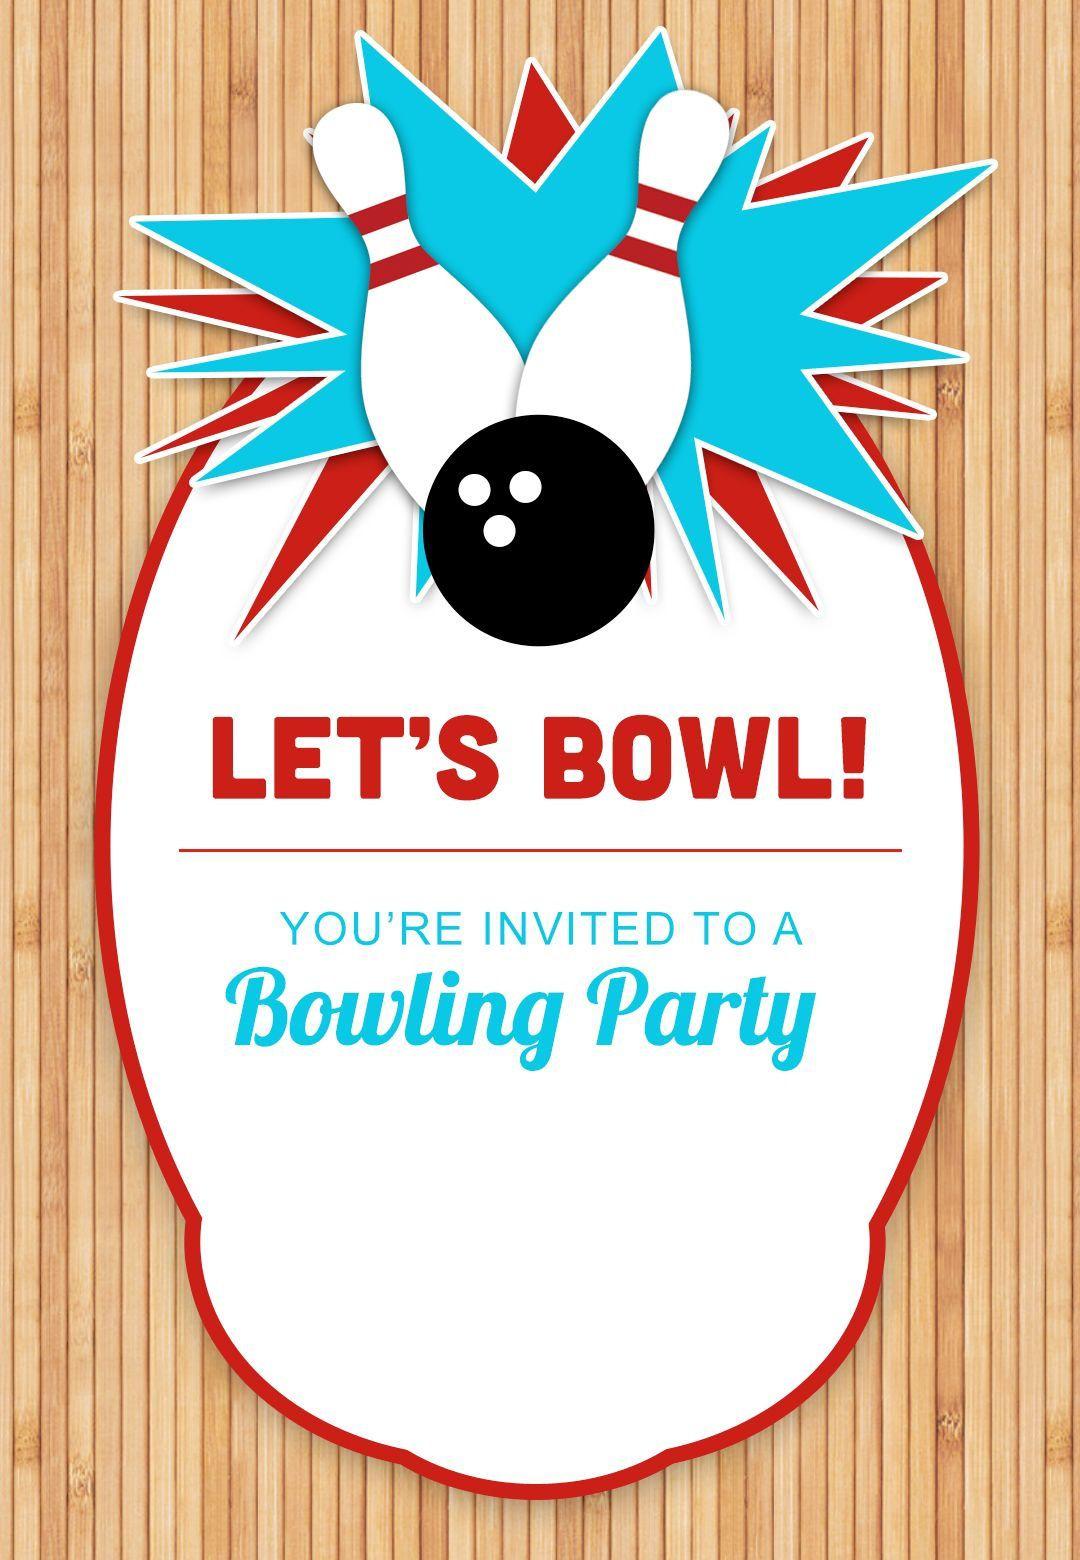 003 Marvelou Bowling Party Invite Printable Free Sample  Birthday InvitationFull